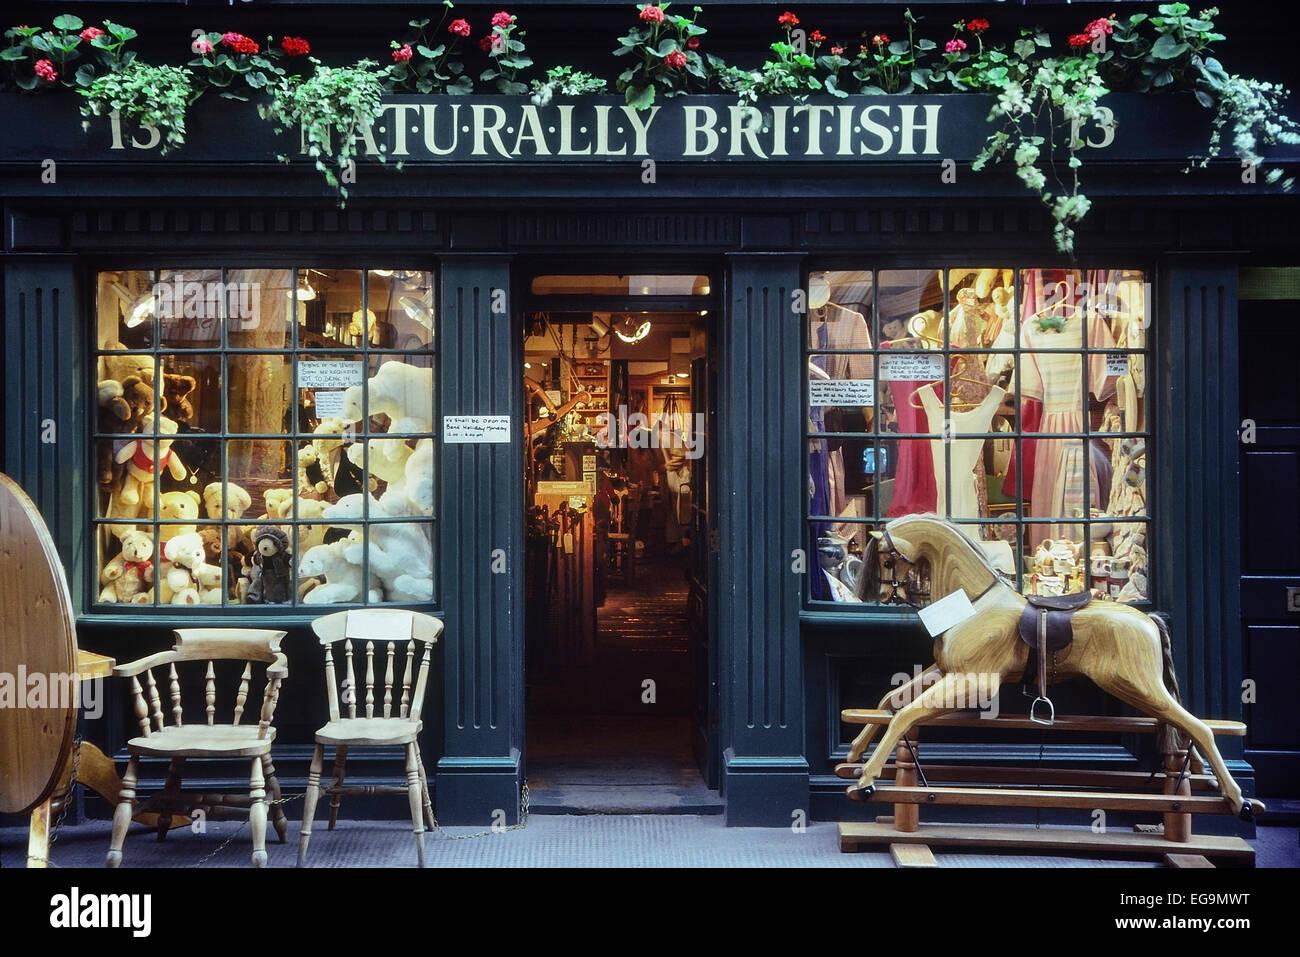 Naturally British shop facade. London. UK Stock Photo, Royalty Free Image: 78889940 - Alamy